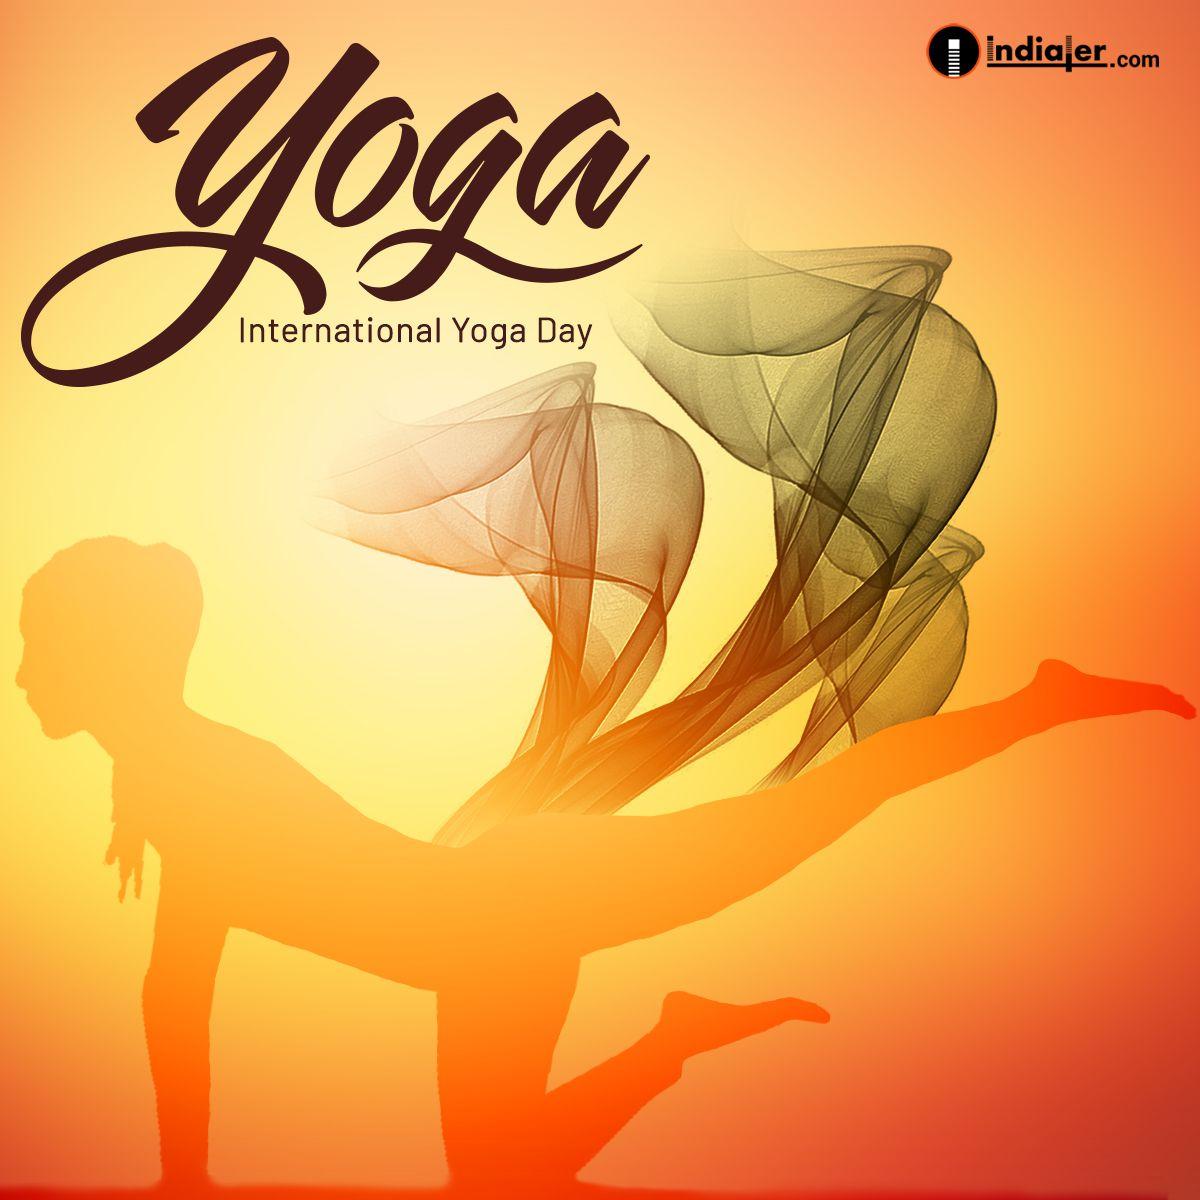 International Yoga Day Free Creative Design Template Psd Yoga Day International Yoga Day Design Template